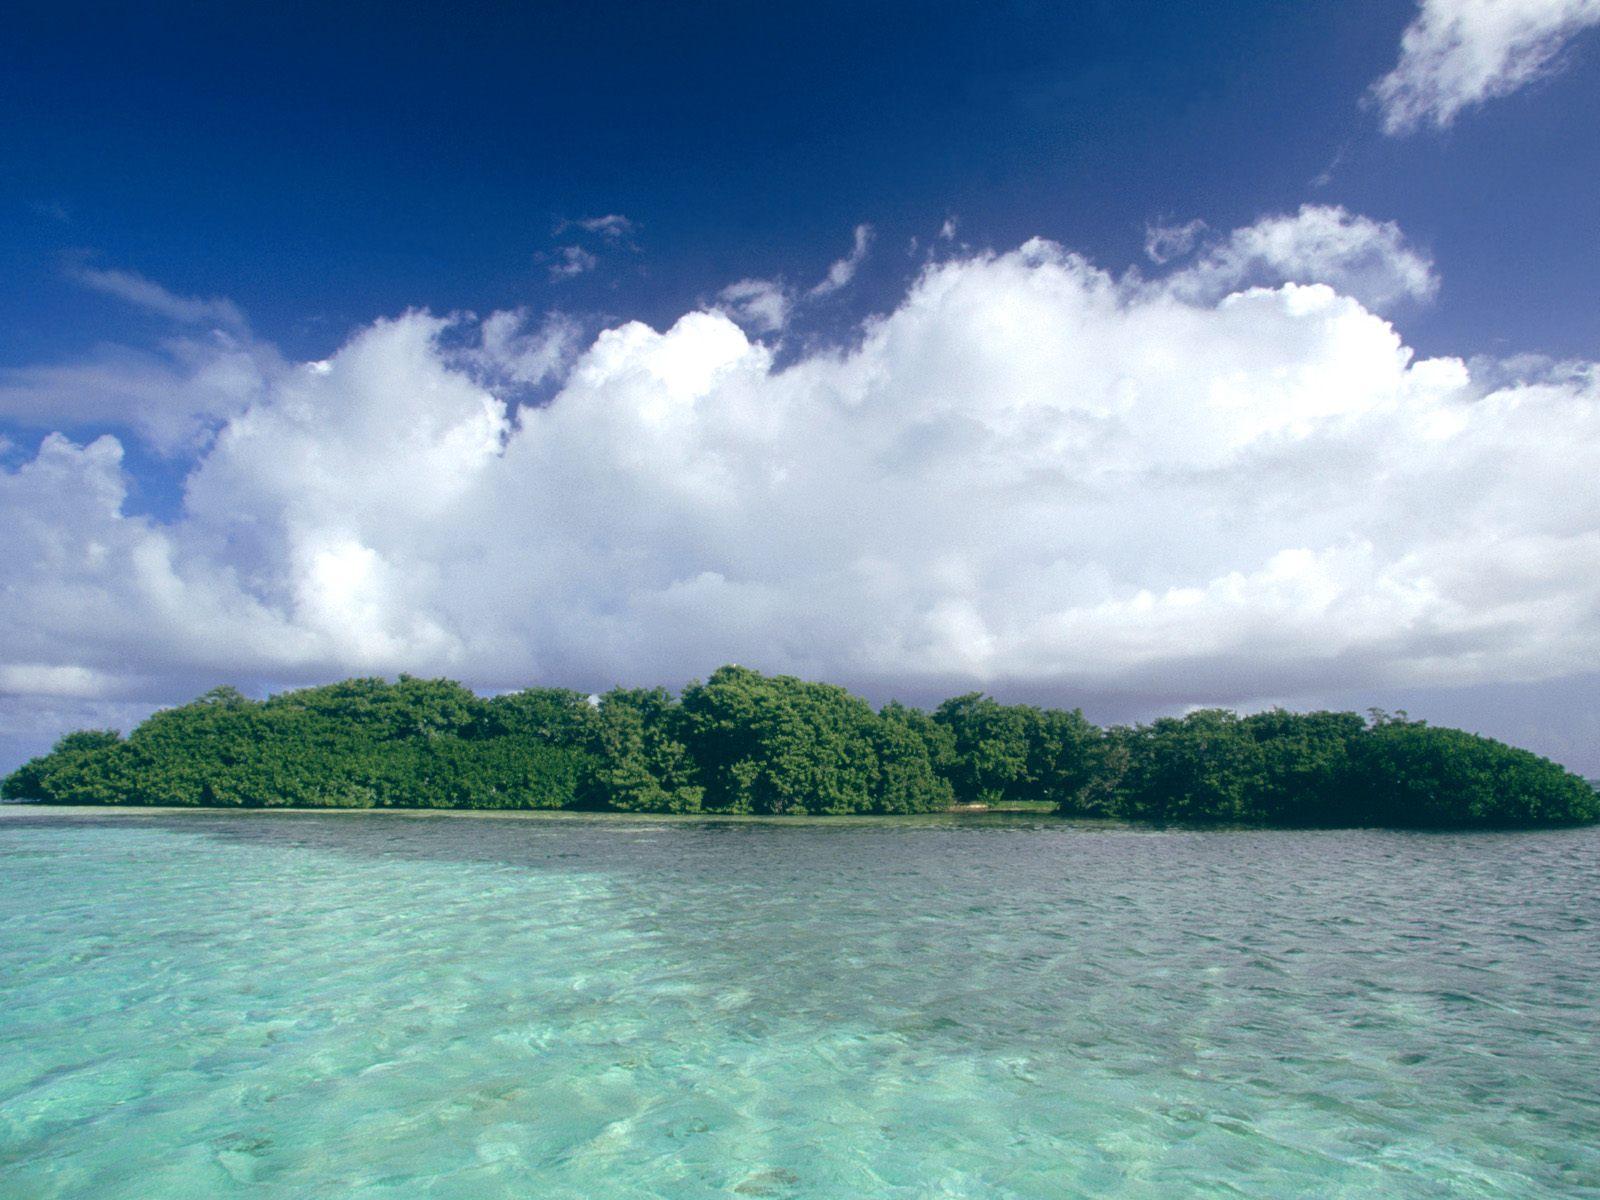 Island Wallpapers HD Desktop Backgrounds 1600x1200